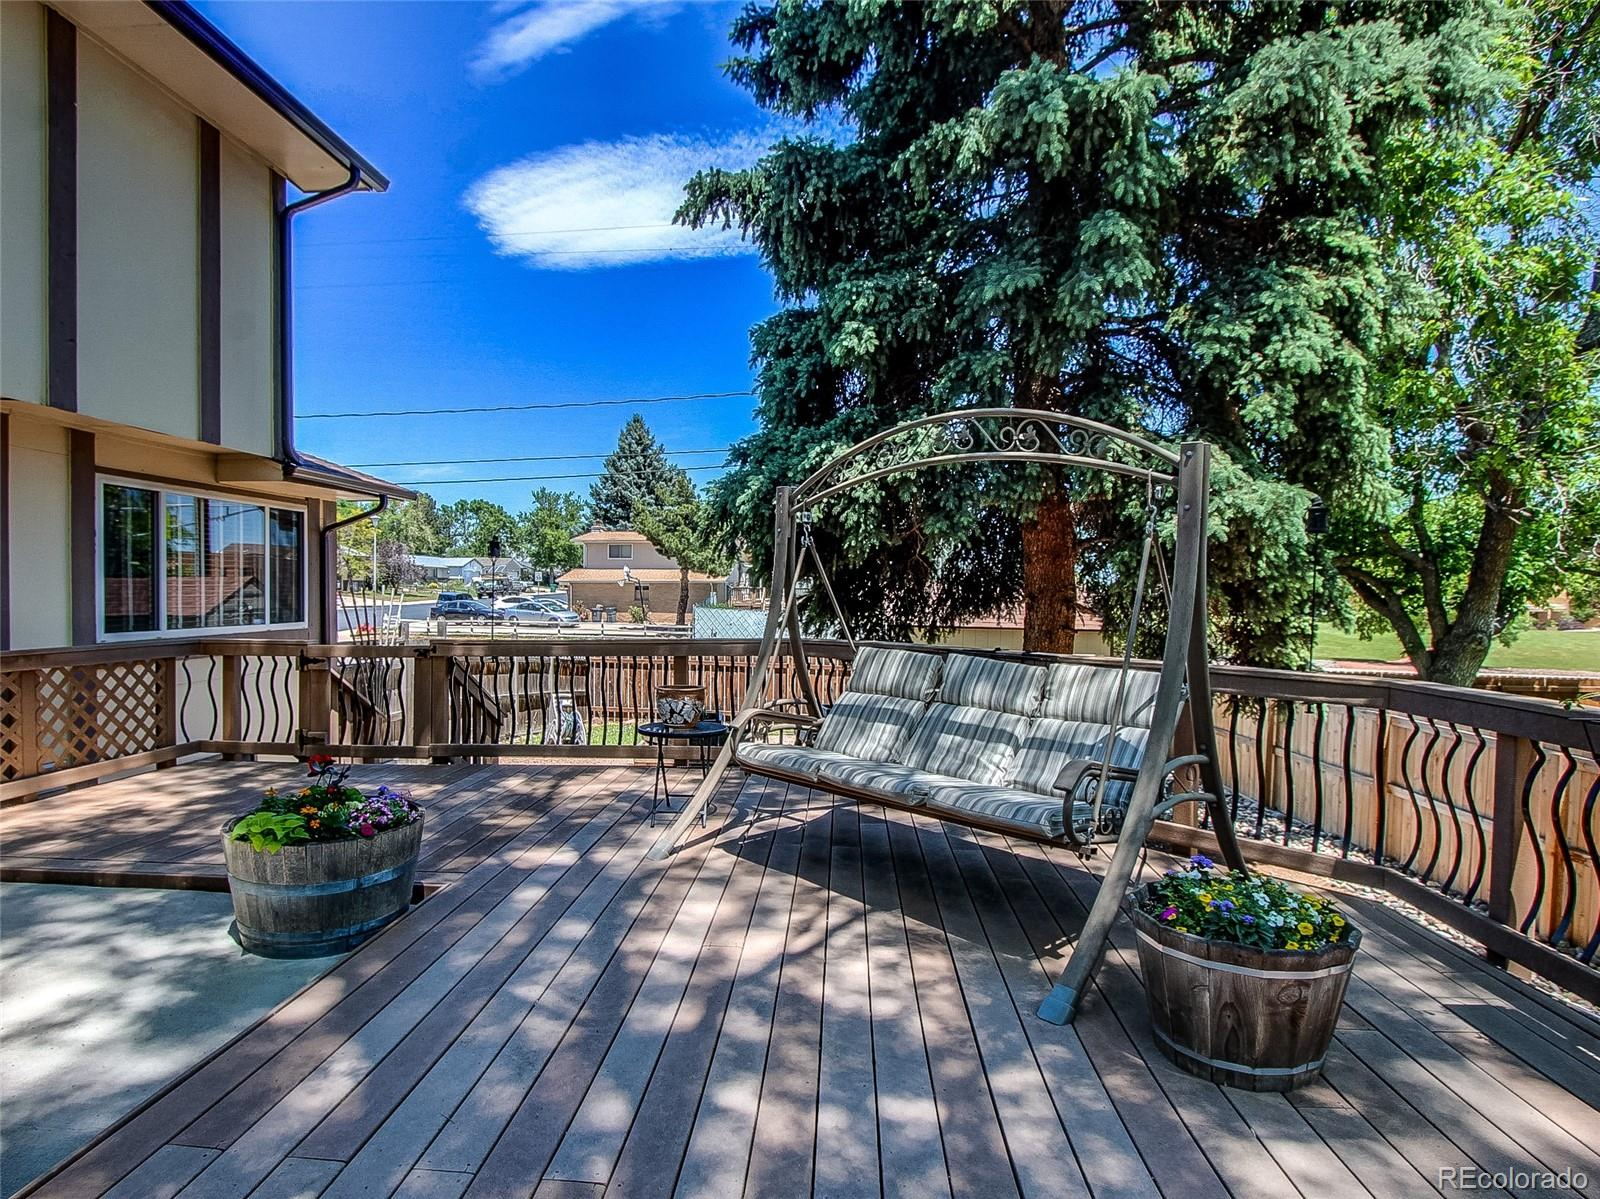 MLS# 3238375 - 34 - 1506 S Hoyt Street, Lakewood, CO 80232